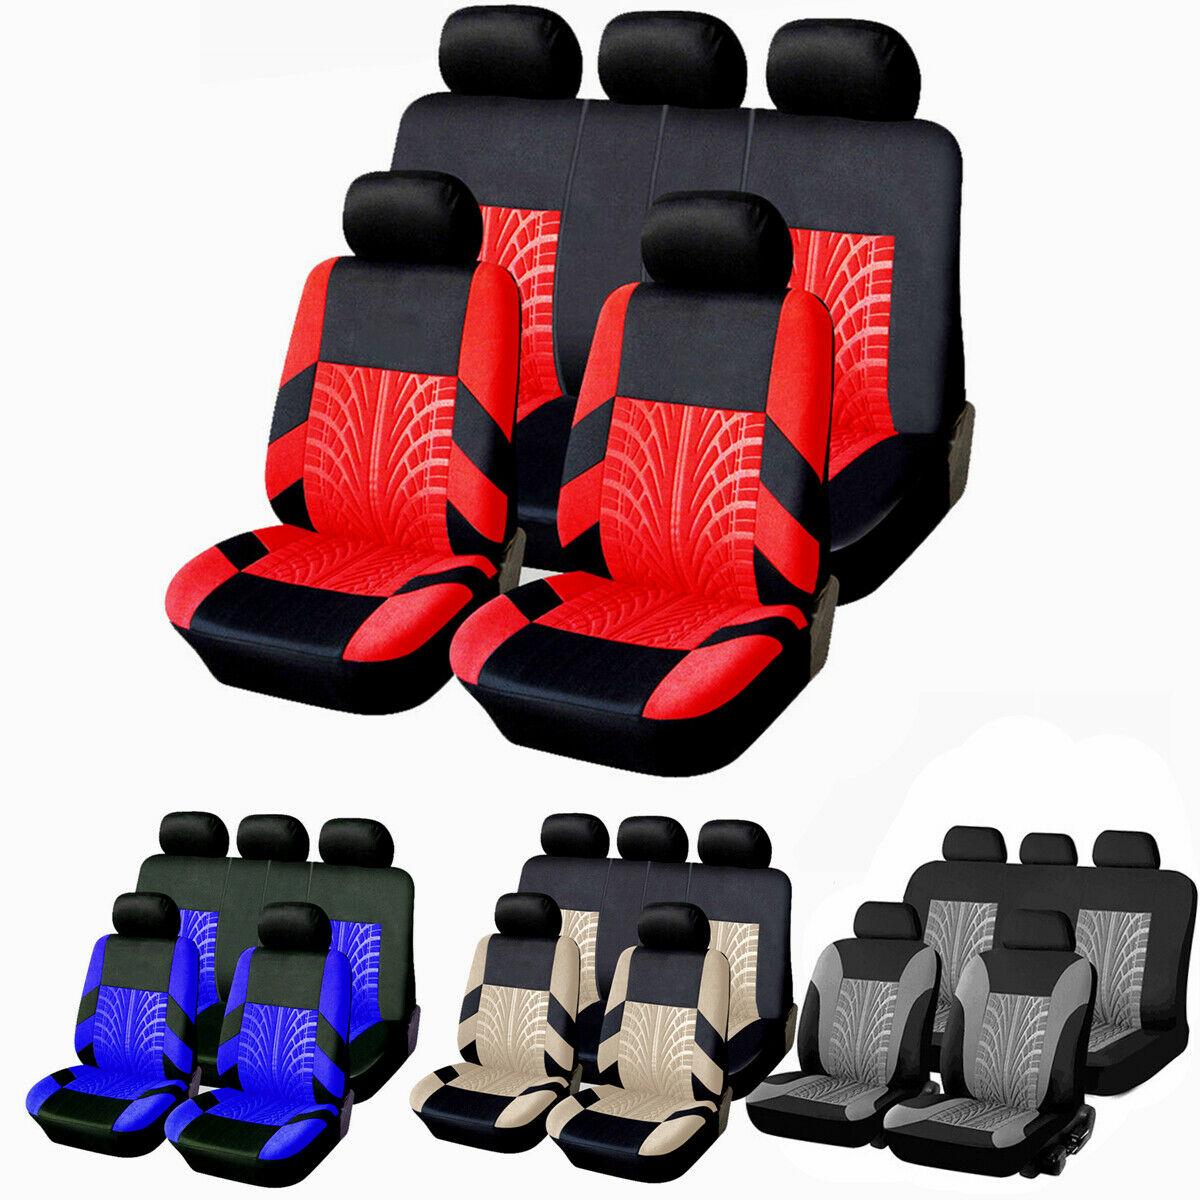 Universal Protectors Full Set Auto Seat Covers for Car Truck SUV Van 4 Colors